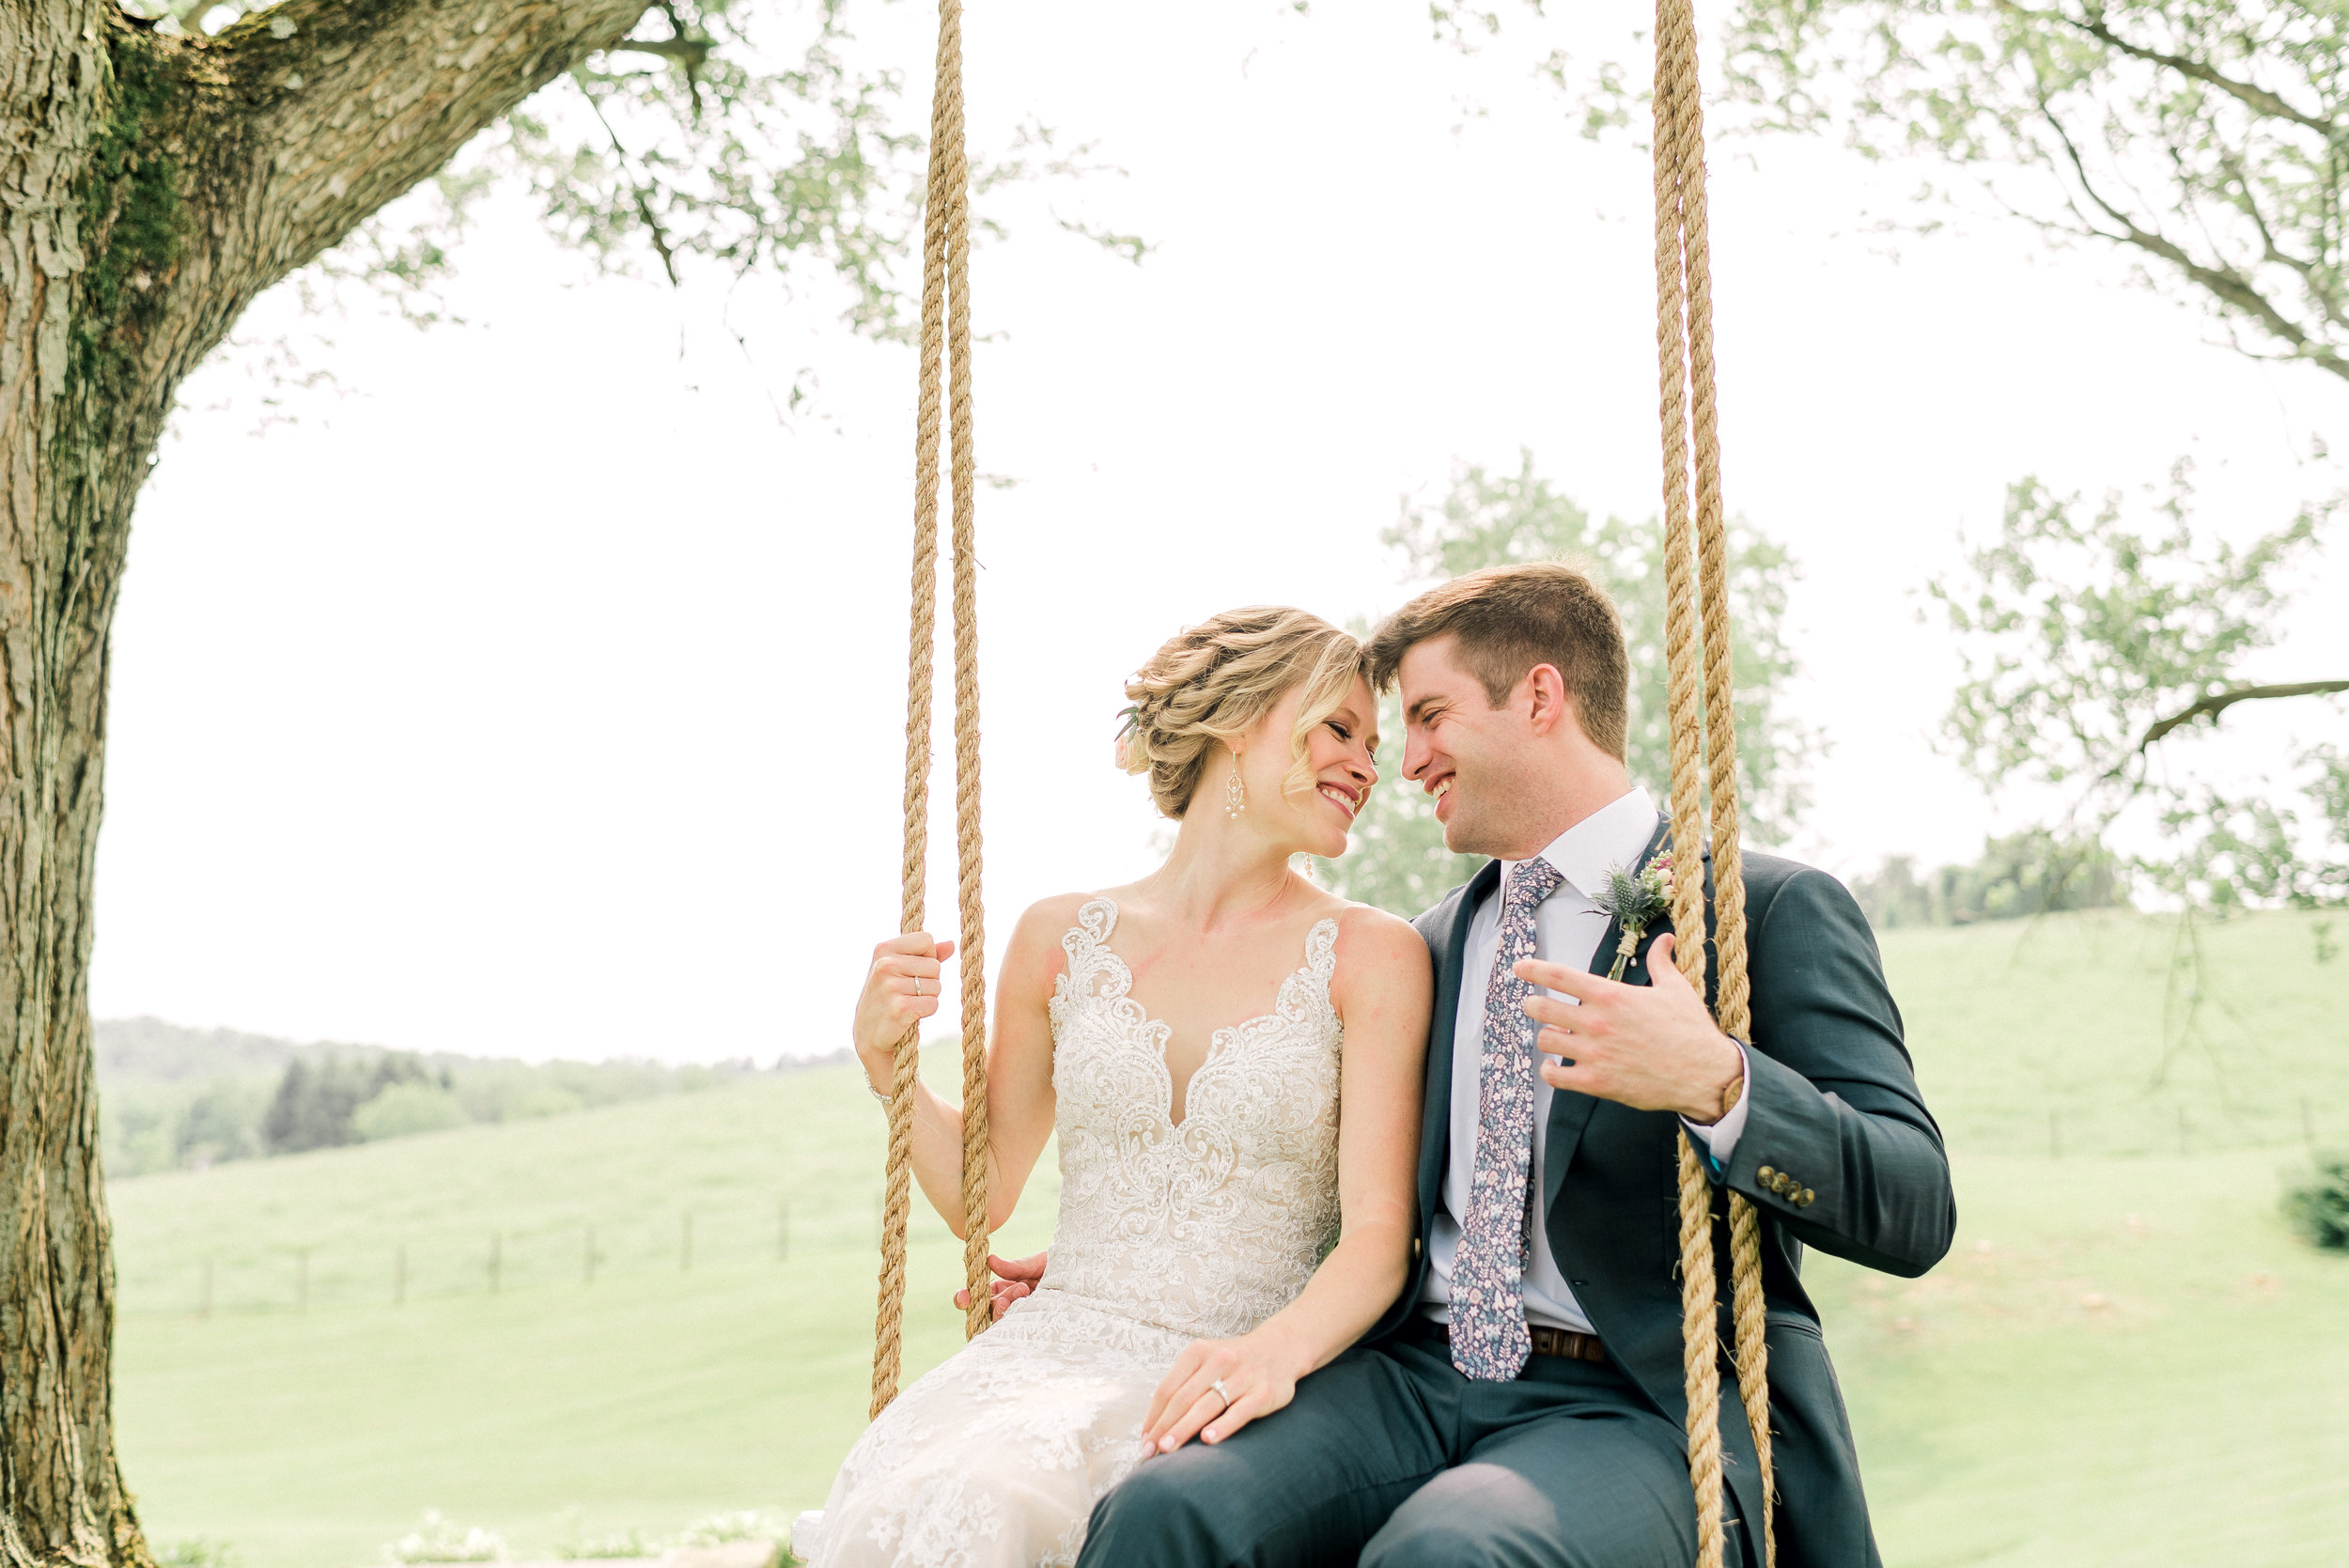 pittsburgh-wedding-photographer-shady-elms-farm-0018.jpg